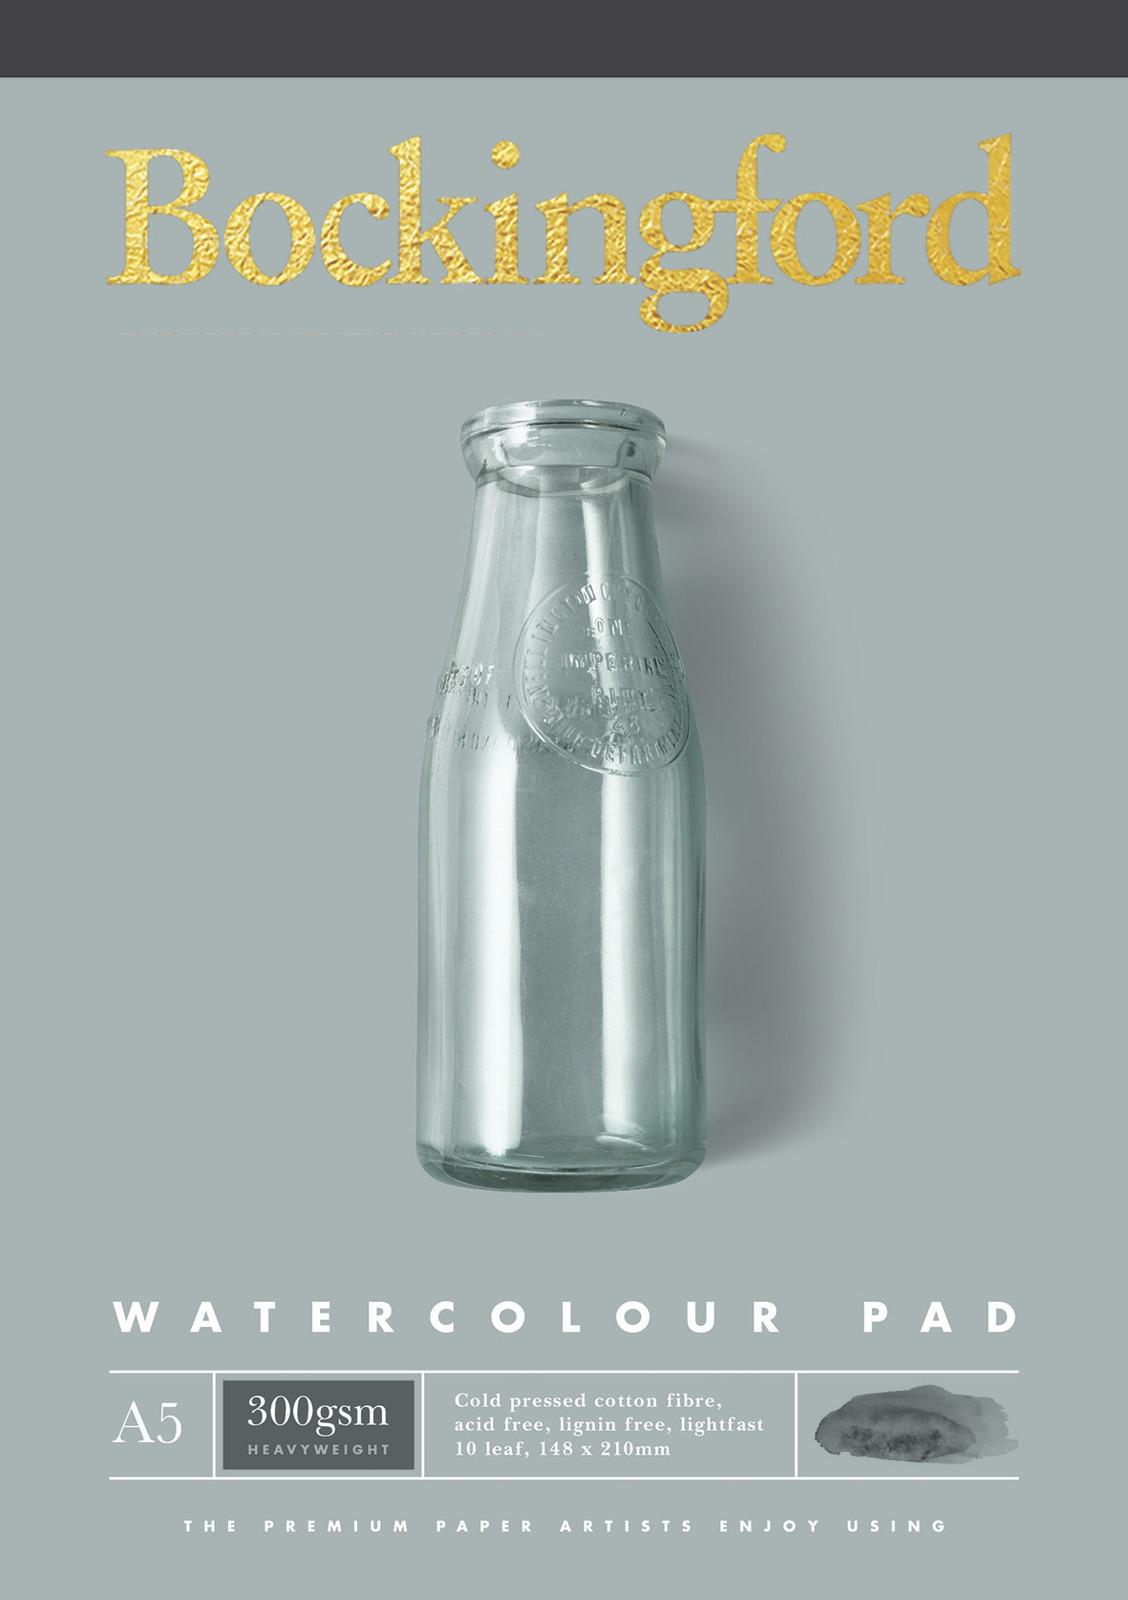 Bockingford: A5 300GSM Watercolour Pad - 10 Leaf image